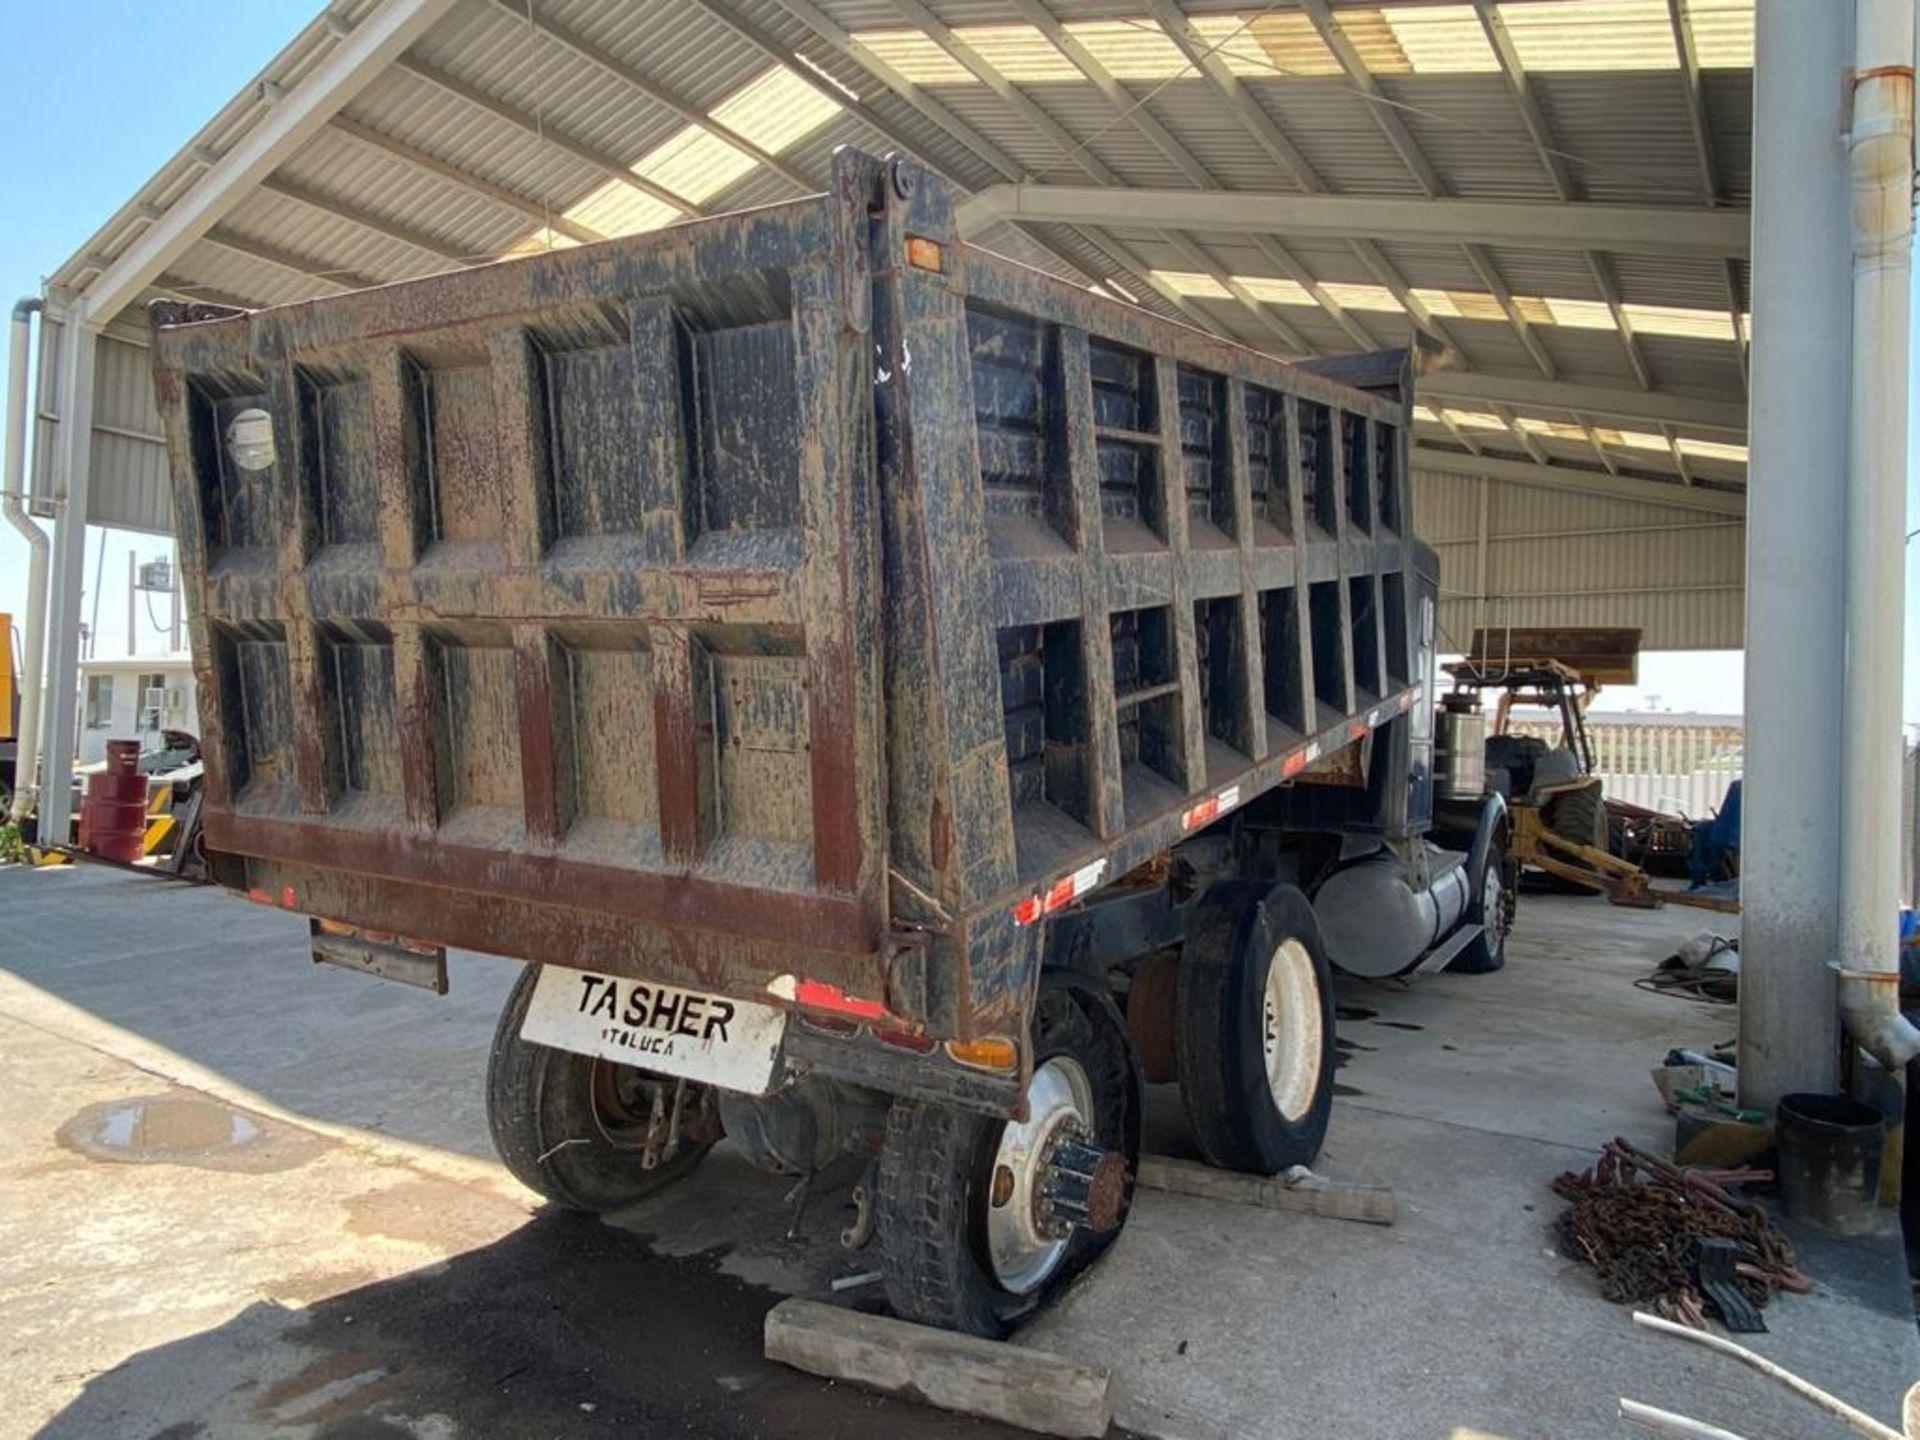 1983 Kenworth Dump Truck, standard transmission of 10 speeds, with Cummins motor - Image 13 of 68